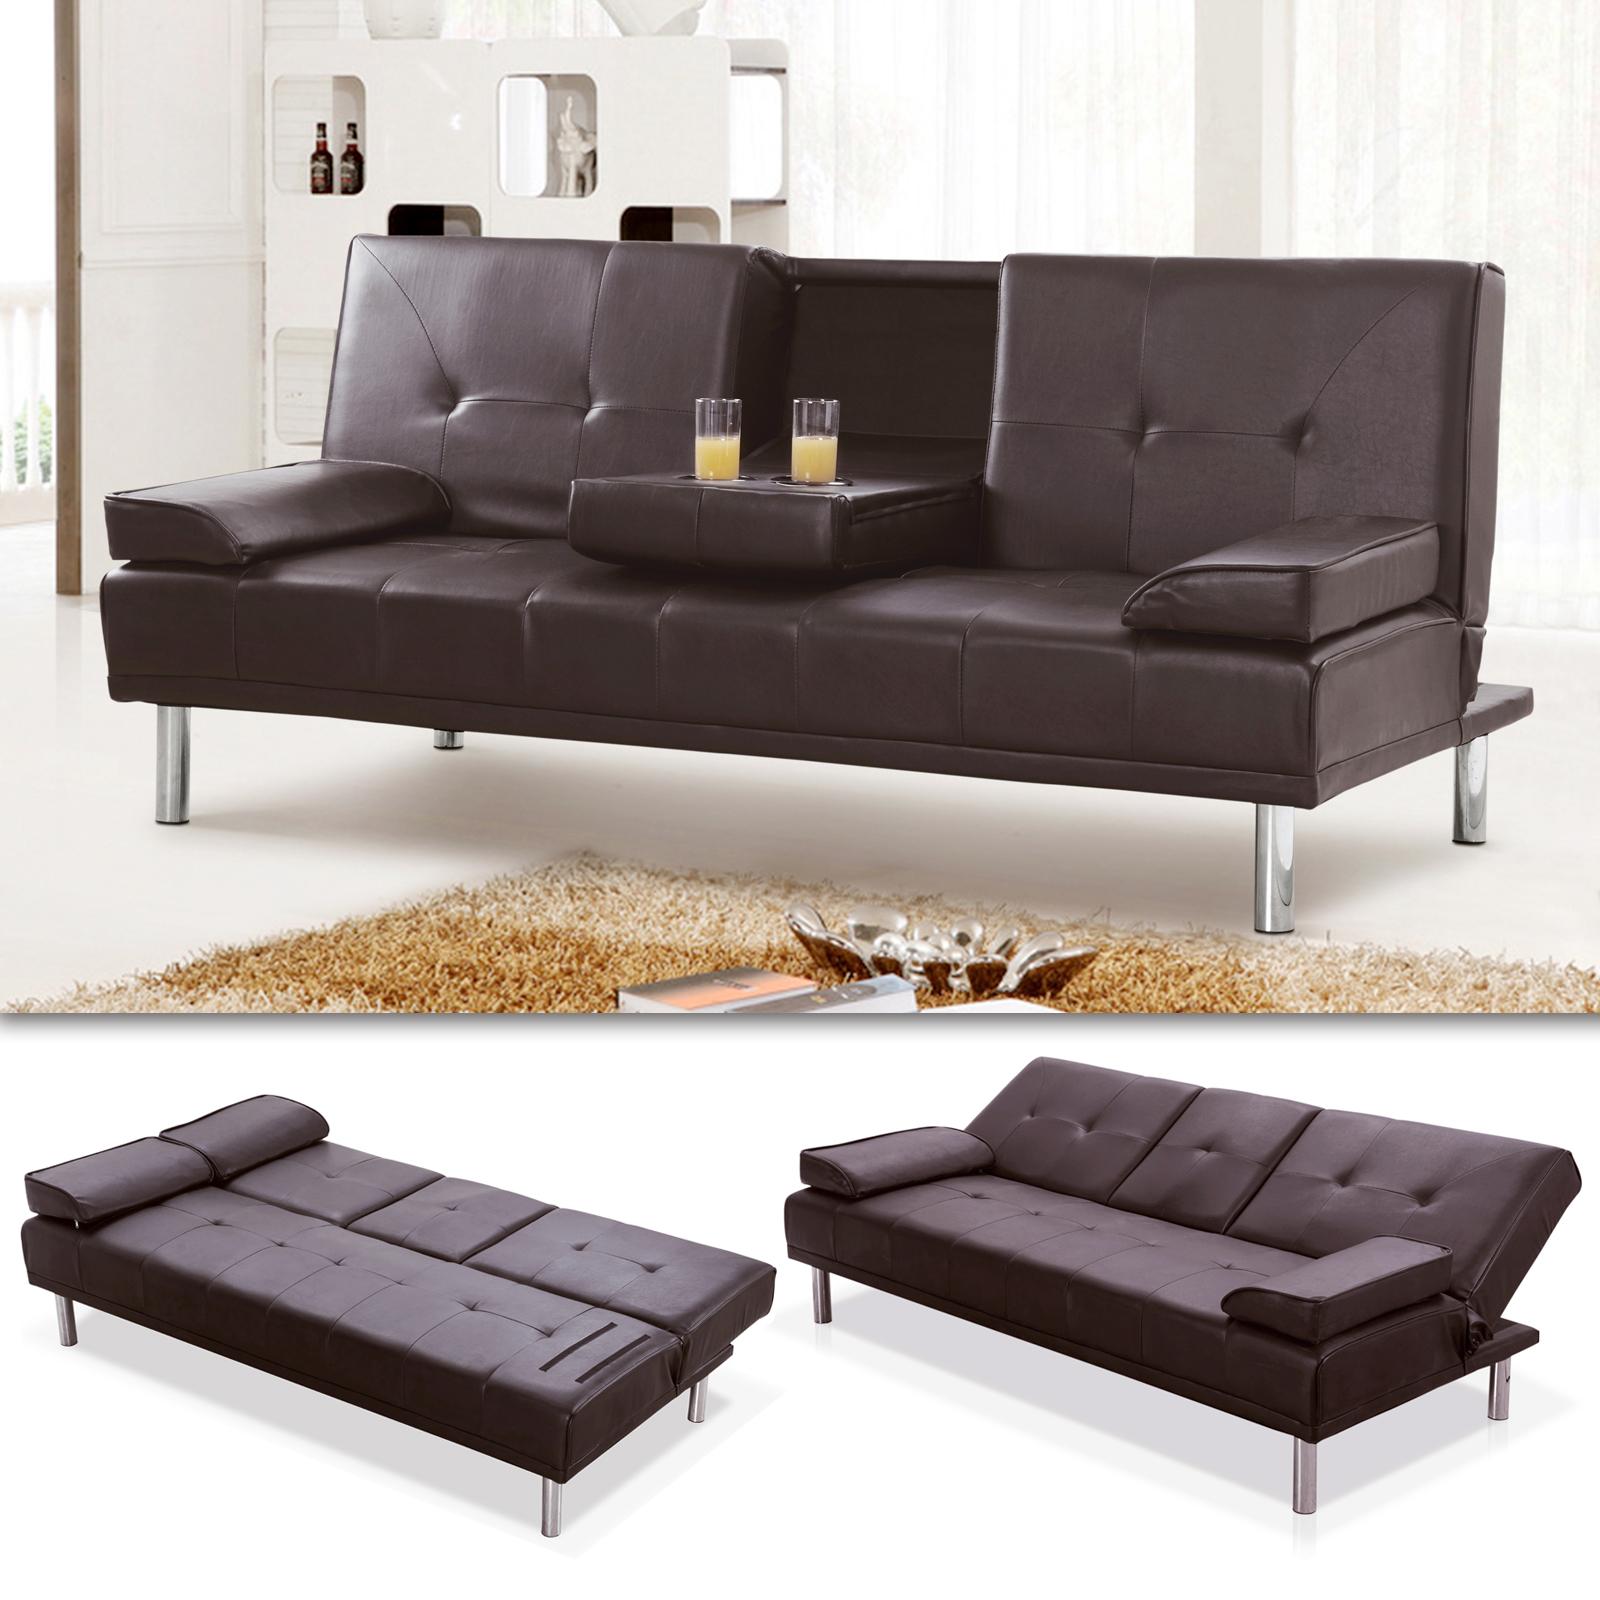 schlafsofa braun kunstleder mit getr nkehalter modernen luxus stil ebay. Black Bedroom Furniture Sets. Home Design Ideas